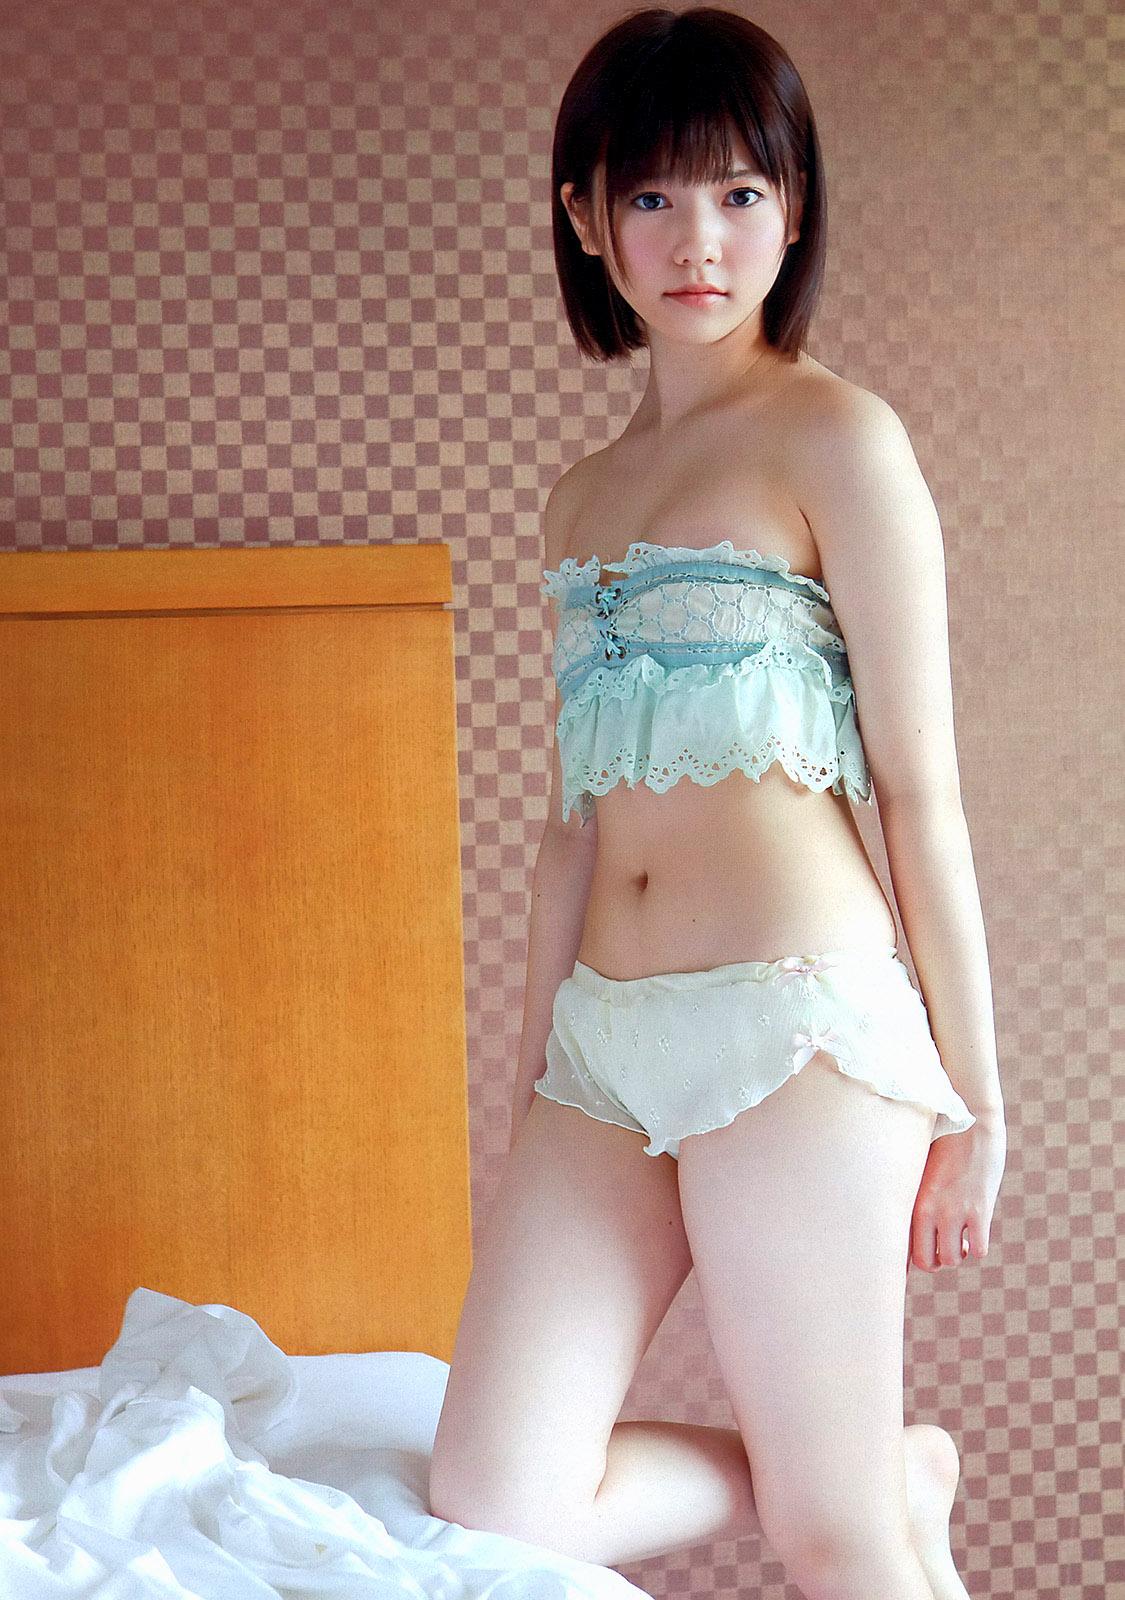 HShimazaki WPB 130805 04.jpg